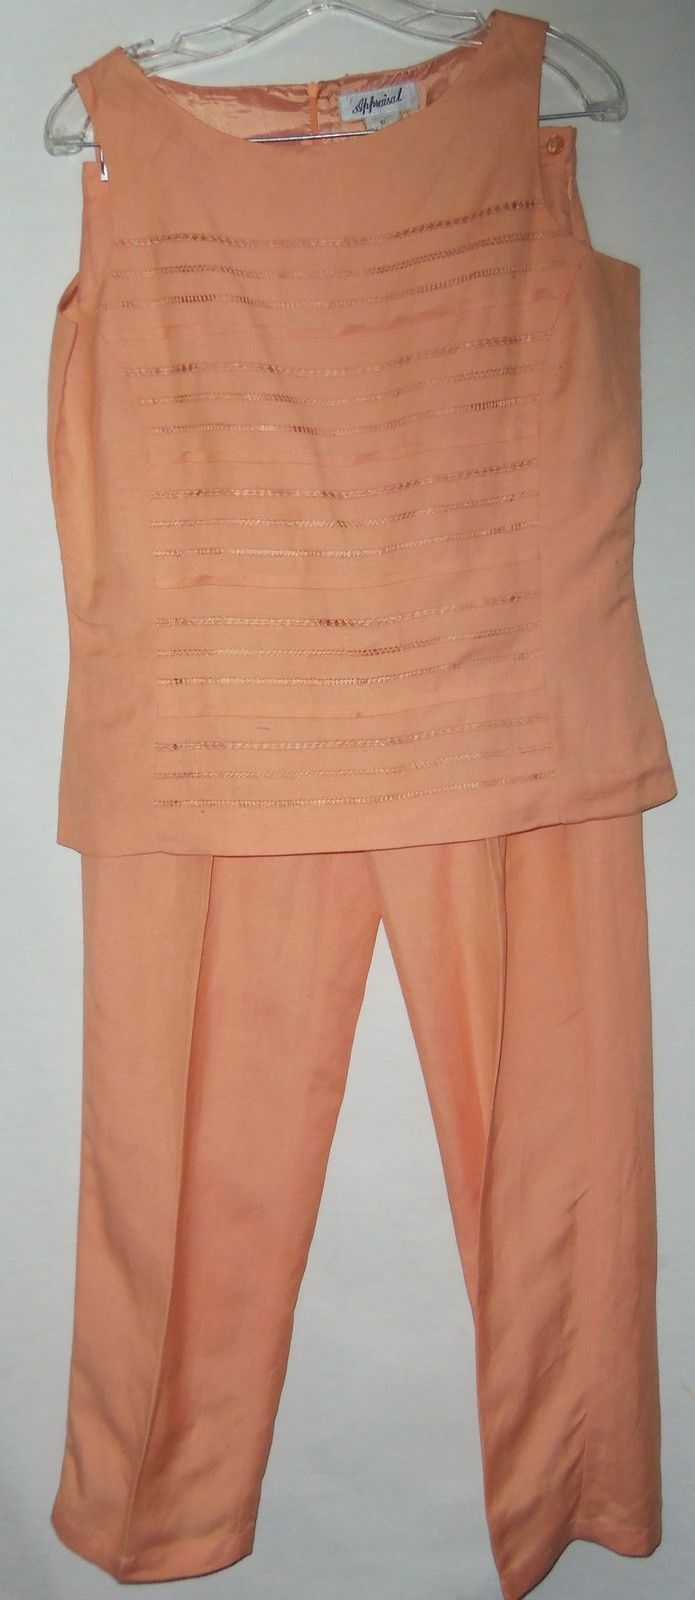 Appraisal Beautiful Orange Lined Sleeveless Top & Pants 8-10